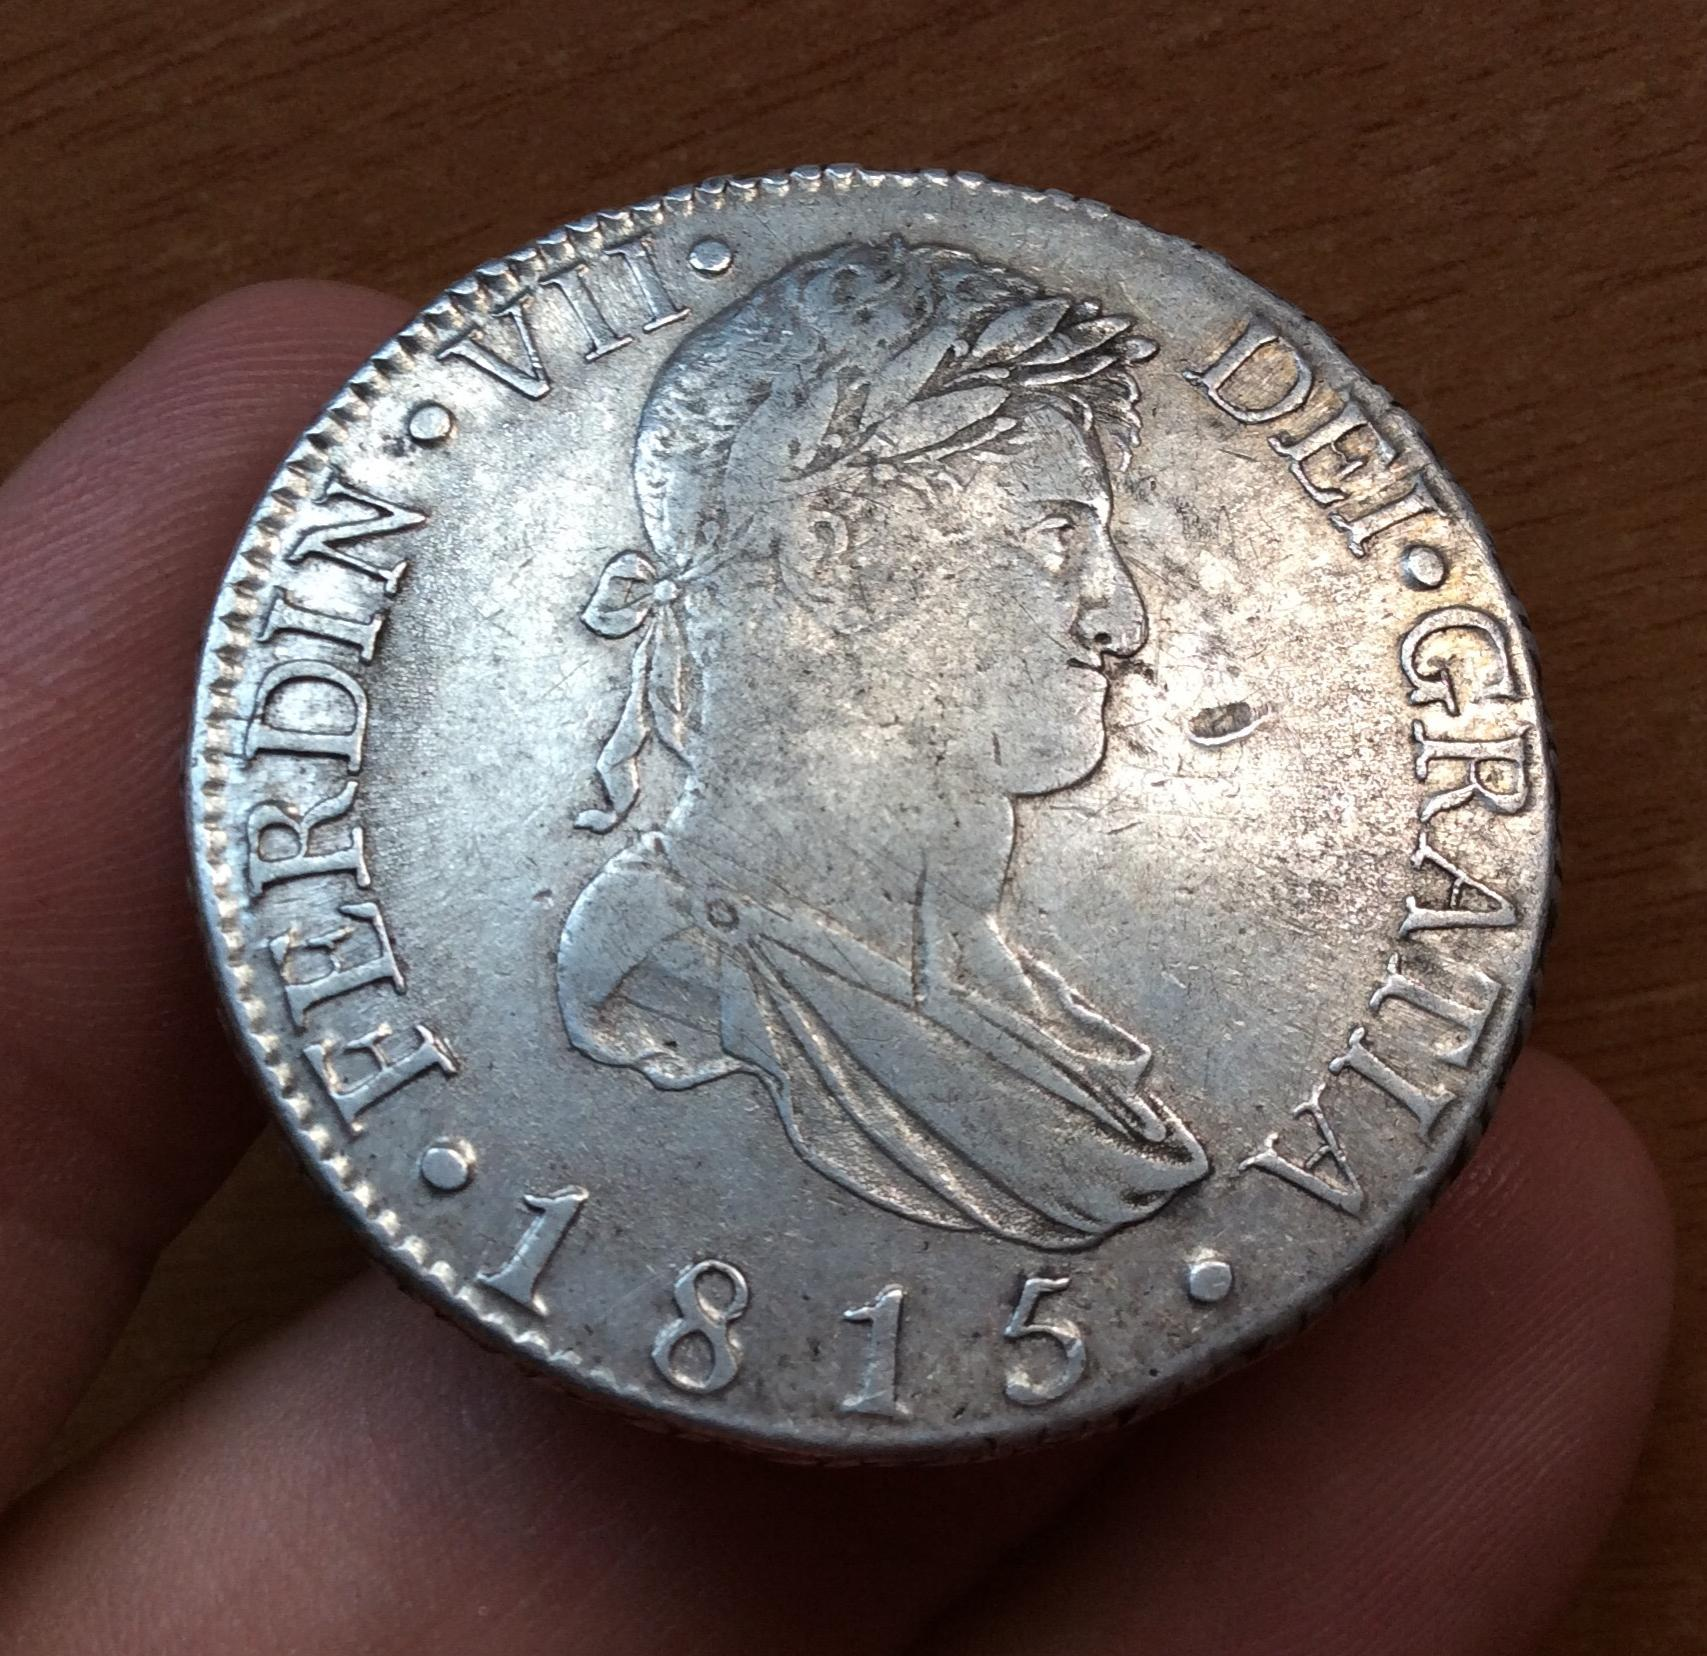 ESCASOS 8 REALES  1815 - CECA PENINSULAR - MADRID - FERNANDO VII